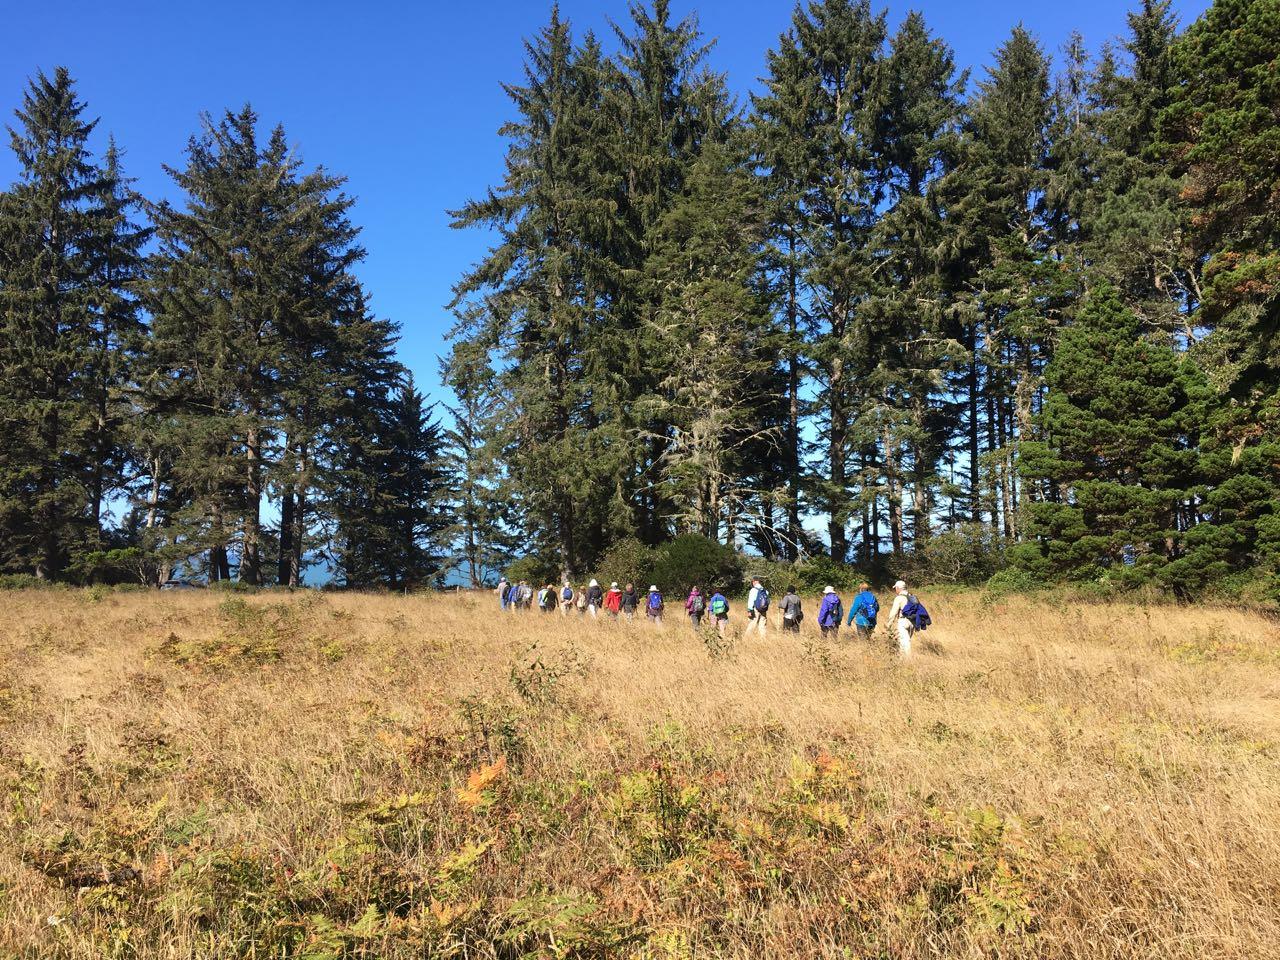 Redwoods 2017 10 08 175 Of 287